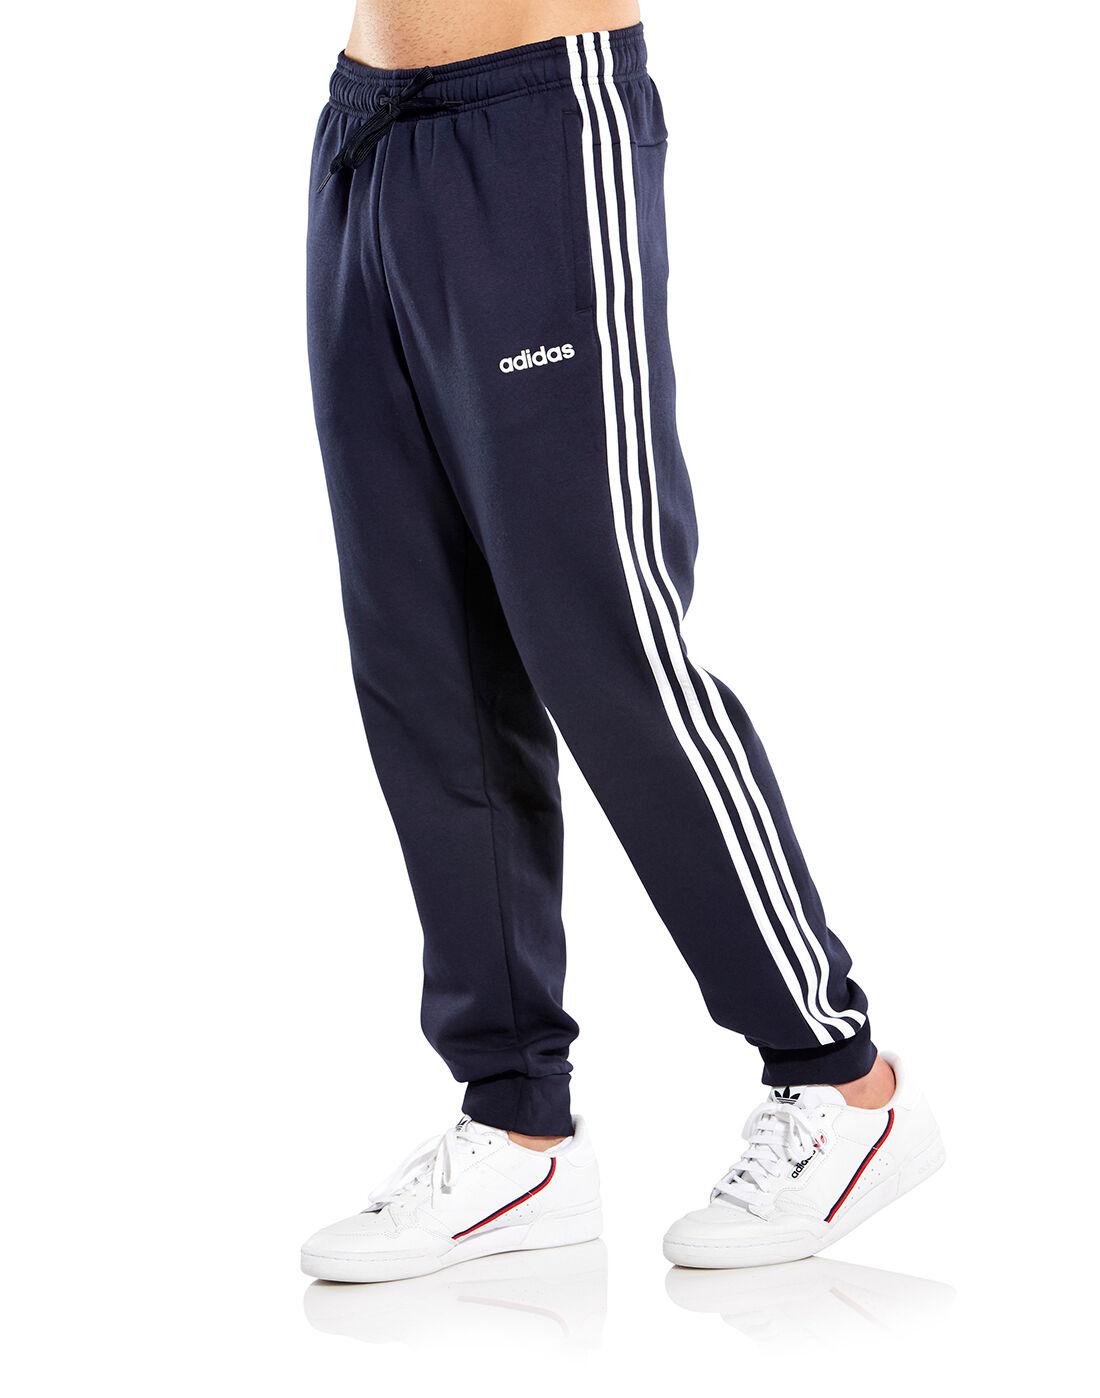 Men's Navy adidas 3 Stripe Track Pants   Life Style Sports